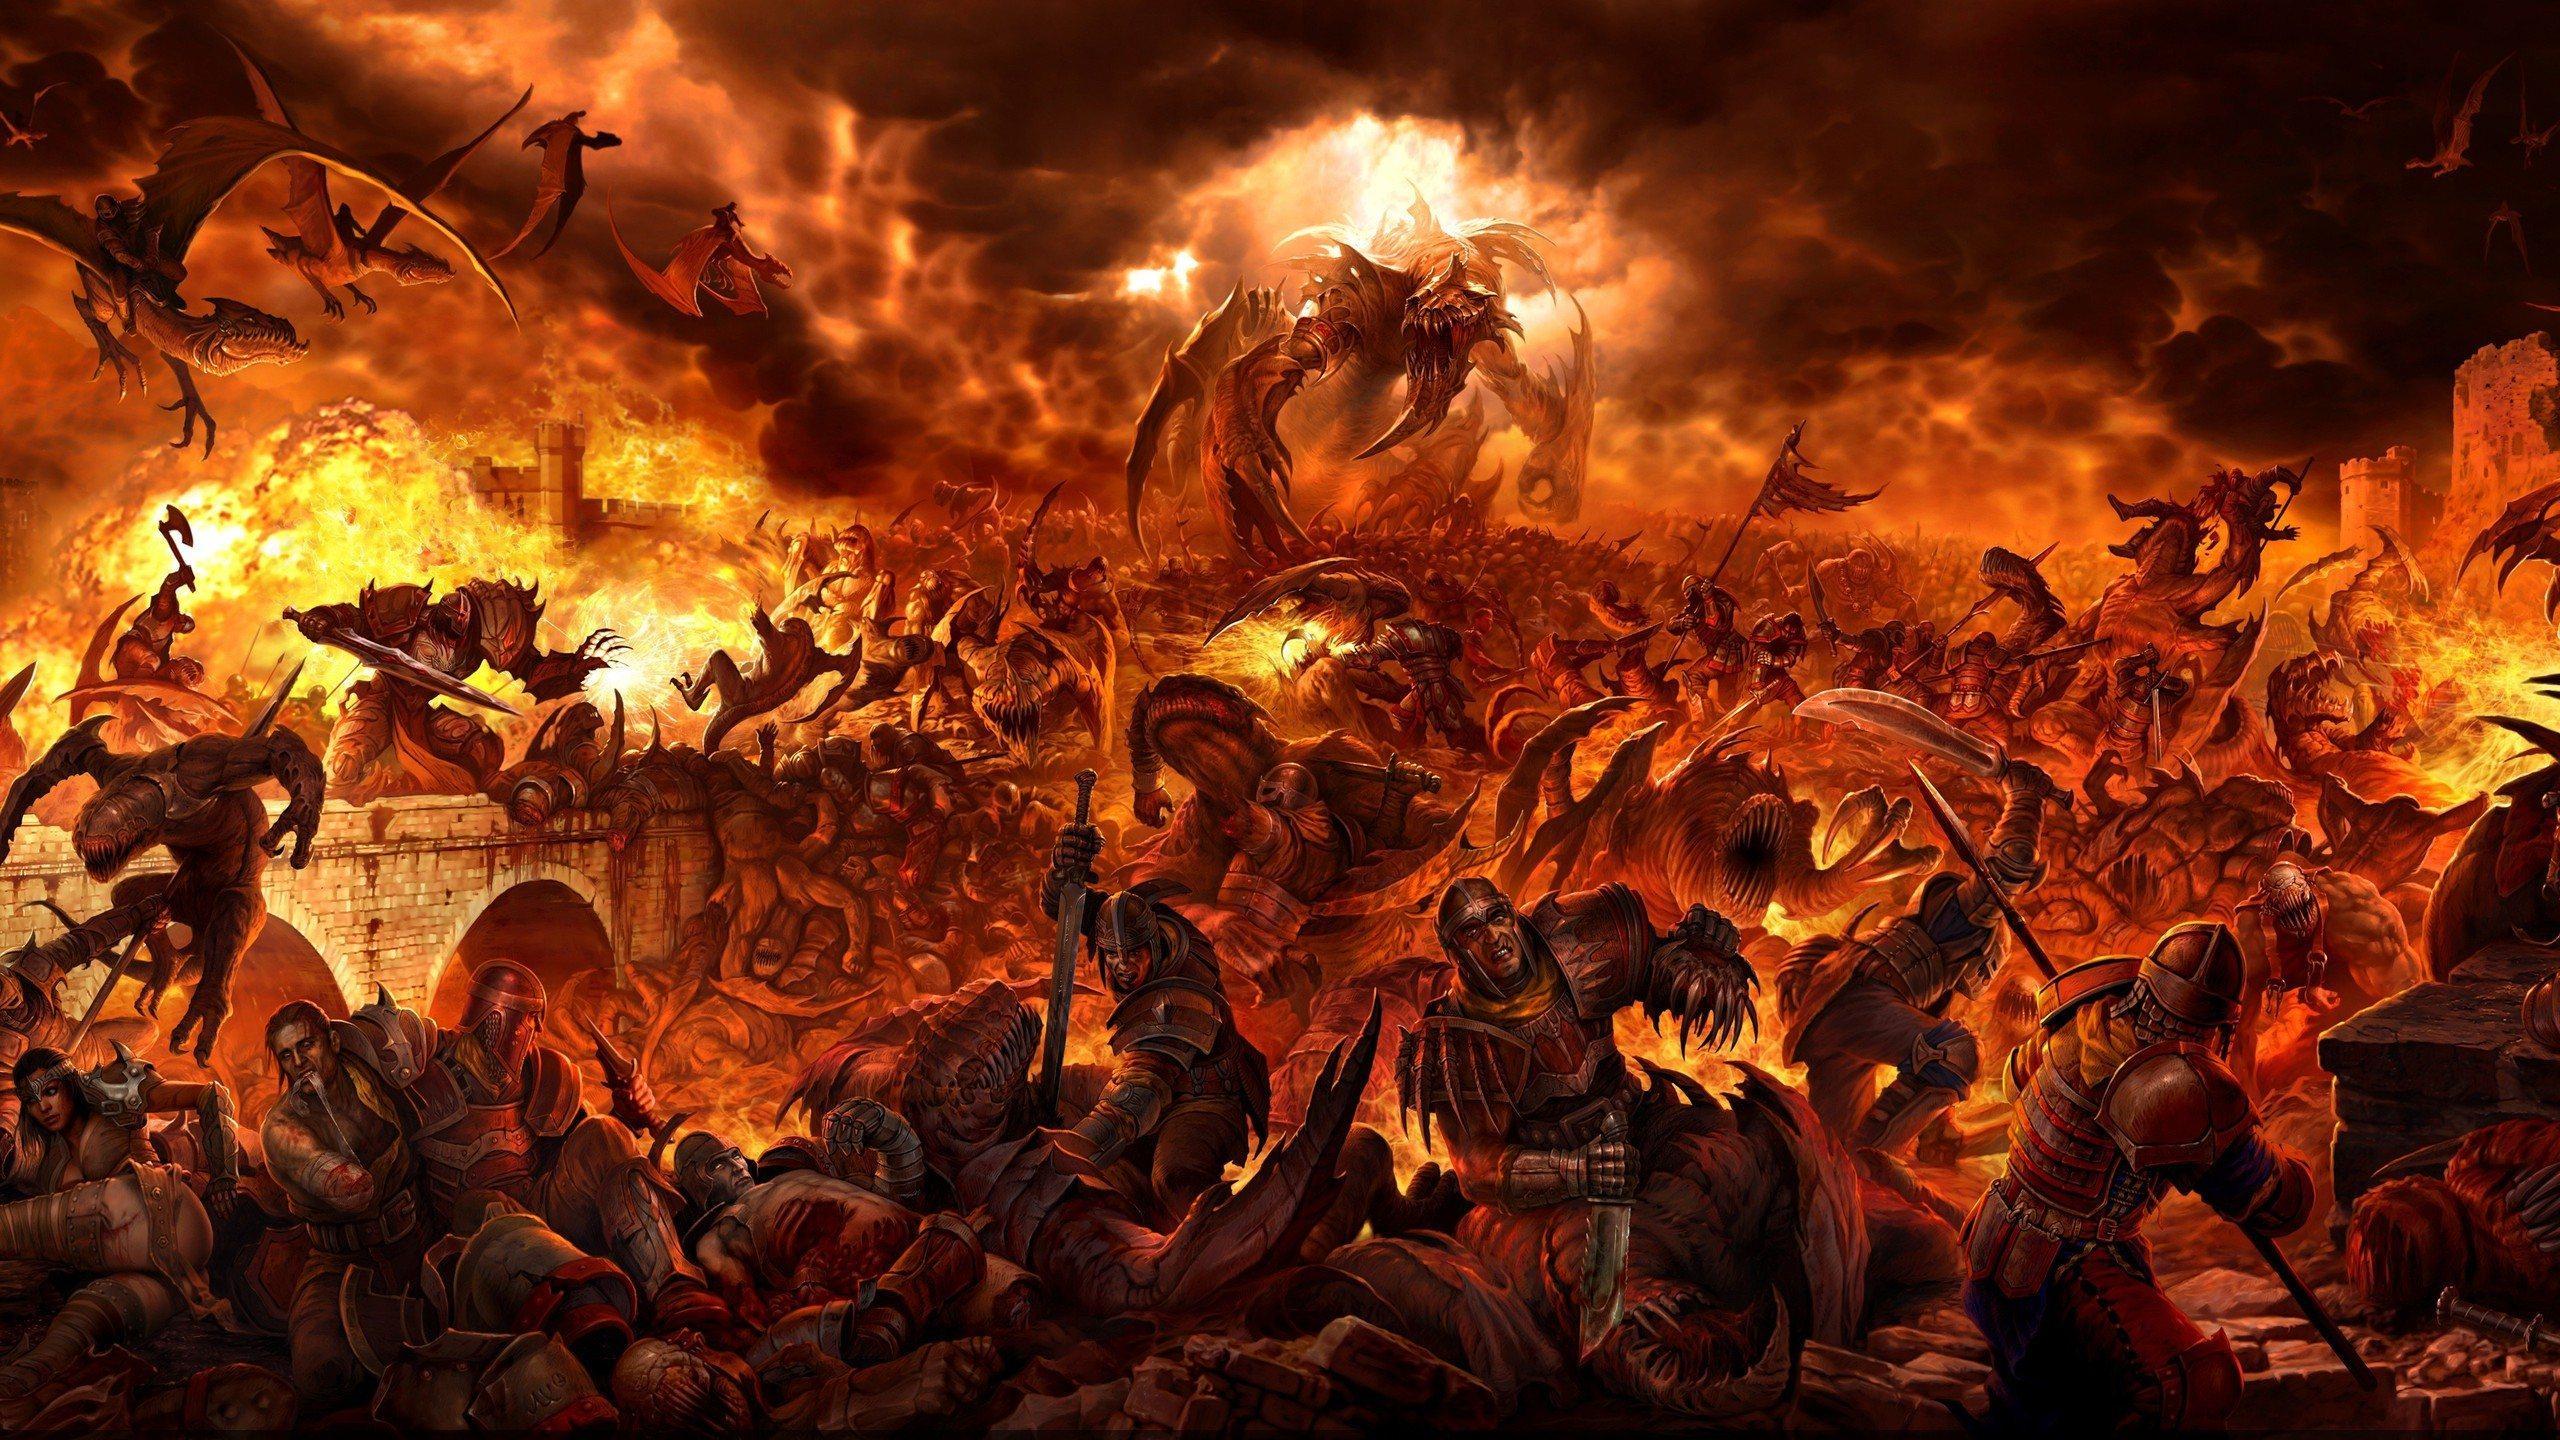 Zo Spreekt Yeshua Hamasiach Jezus Christus Tot De Sadist